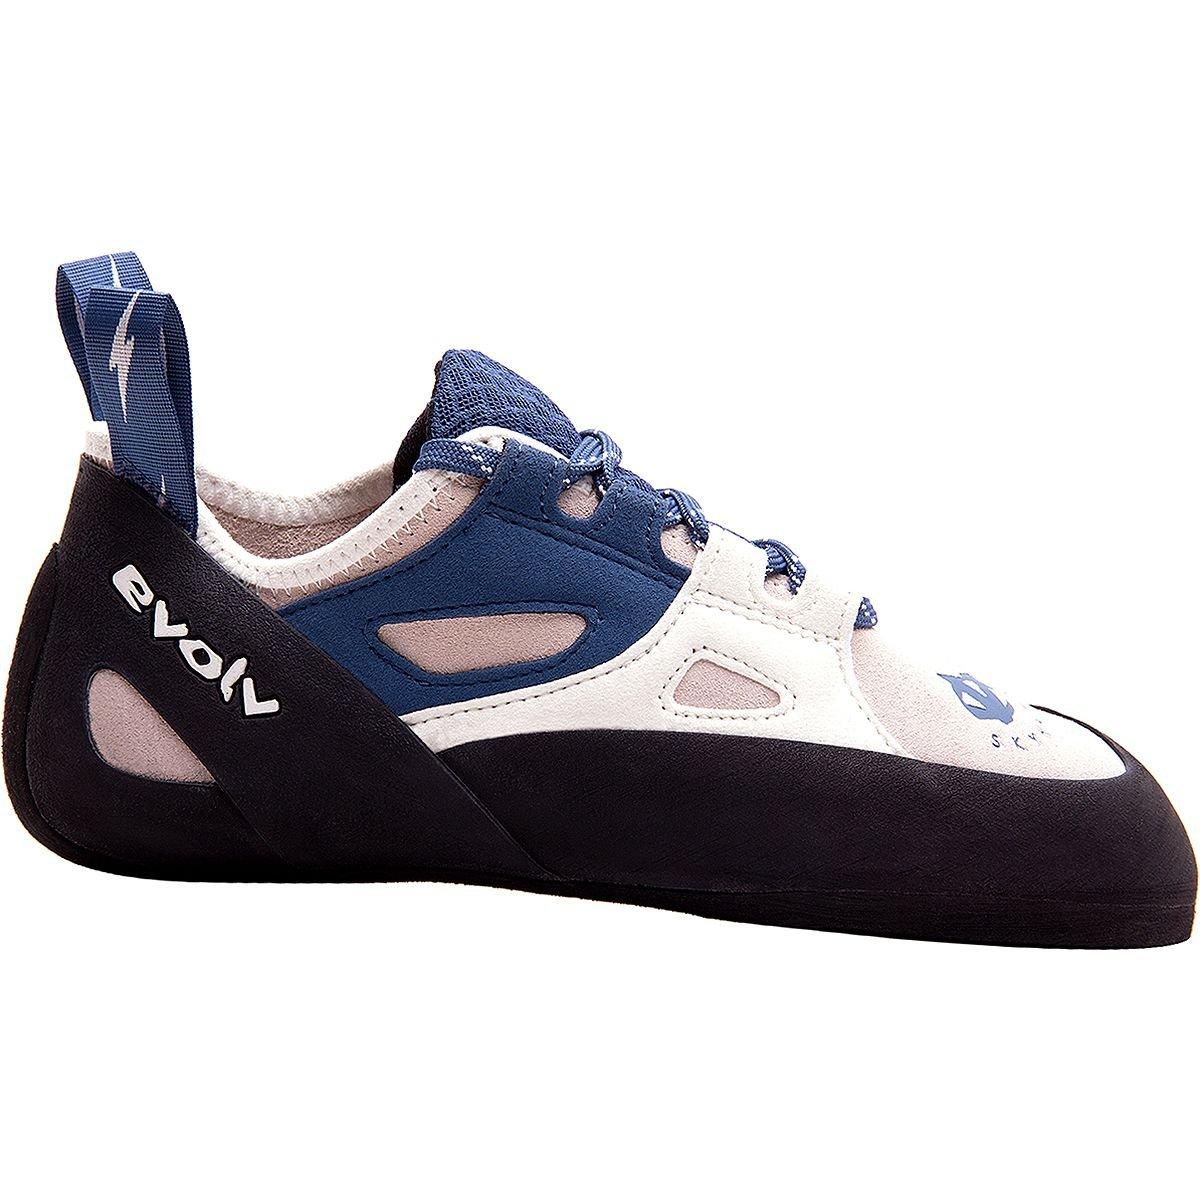 Evolv Skyhawk Climbing Shoe – Women 's ホワイト/ブルー 11 B(M) US